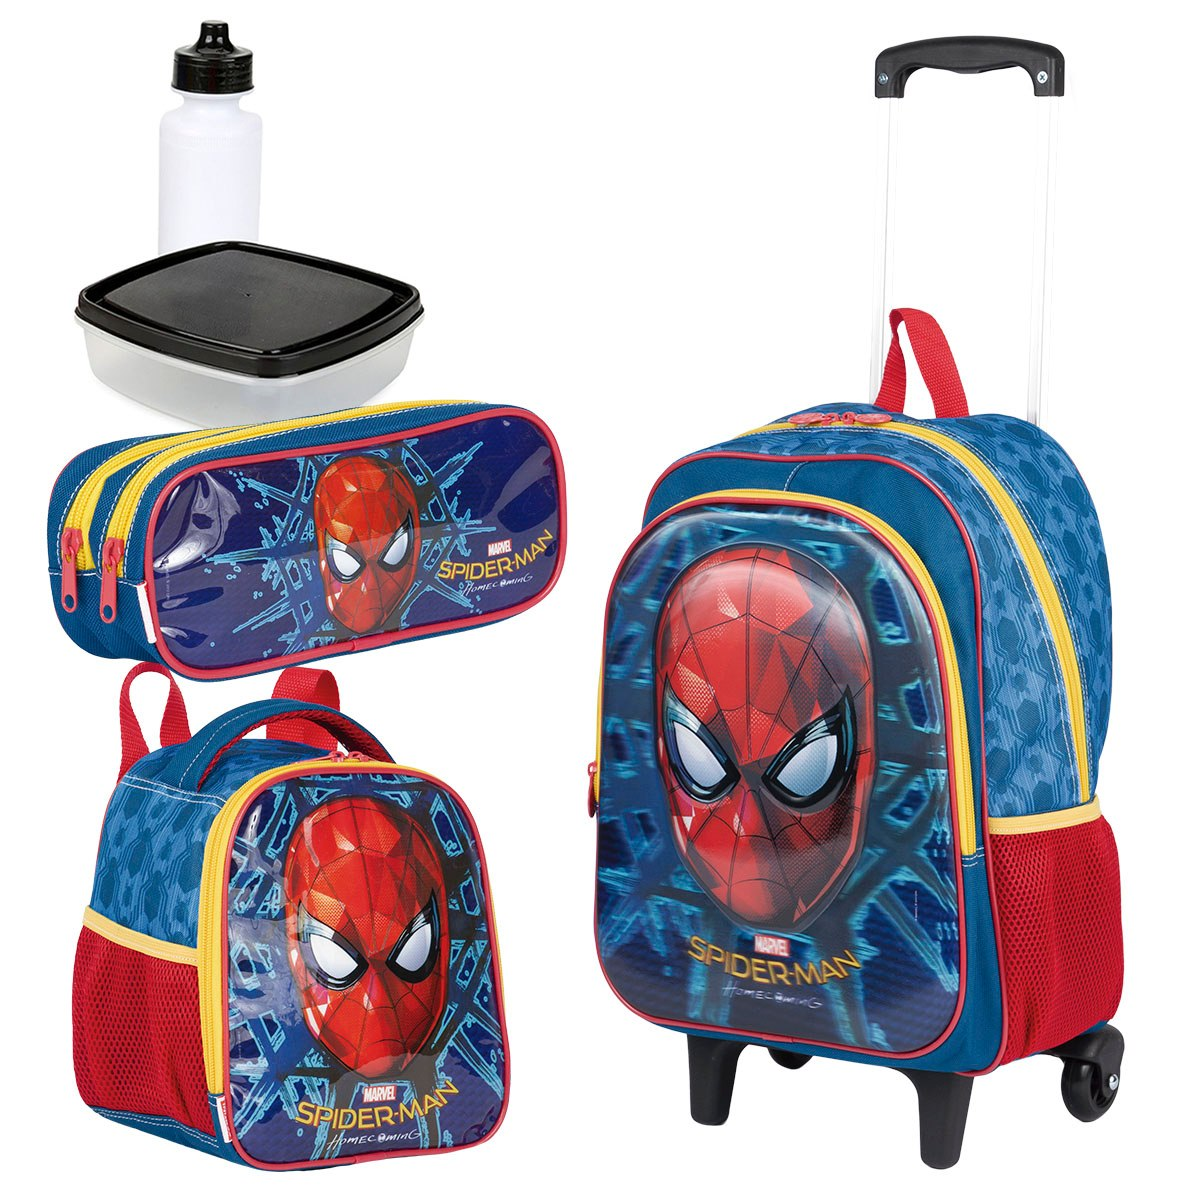 5b9527218b9926 kit mochila rodas spider man 18x lancheira estojo sestini. Carregando zoom.